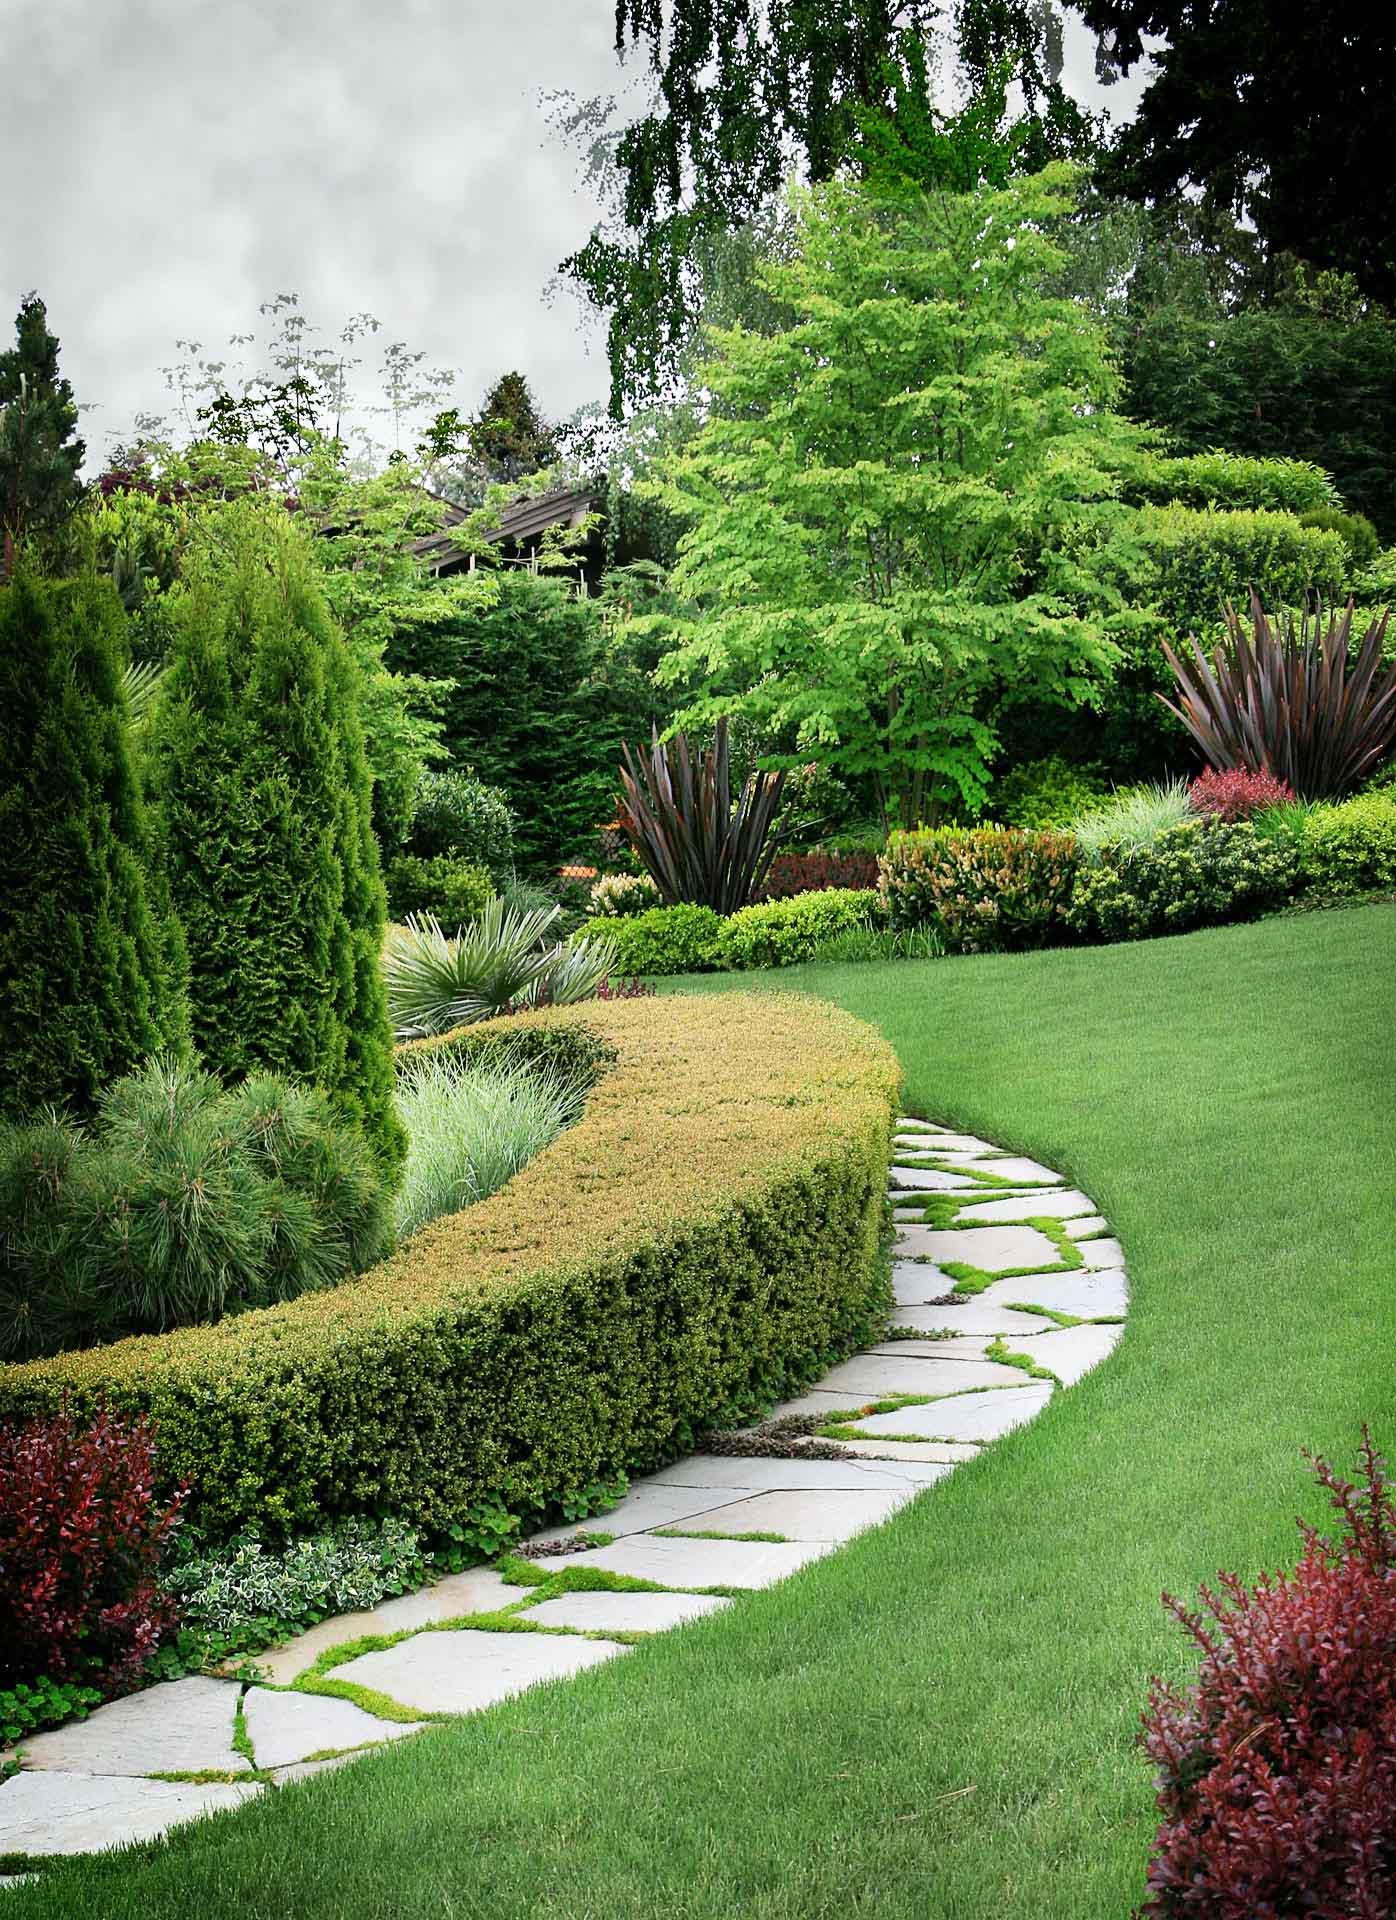 Lakeshore Garden -